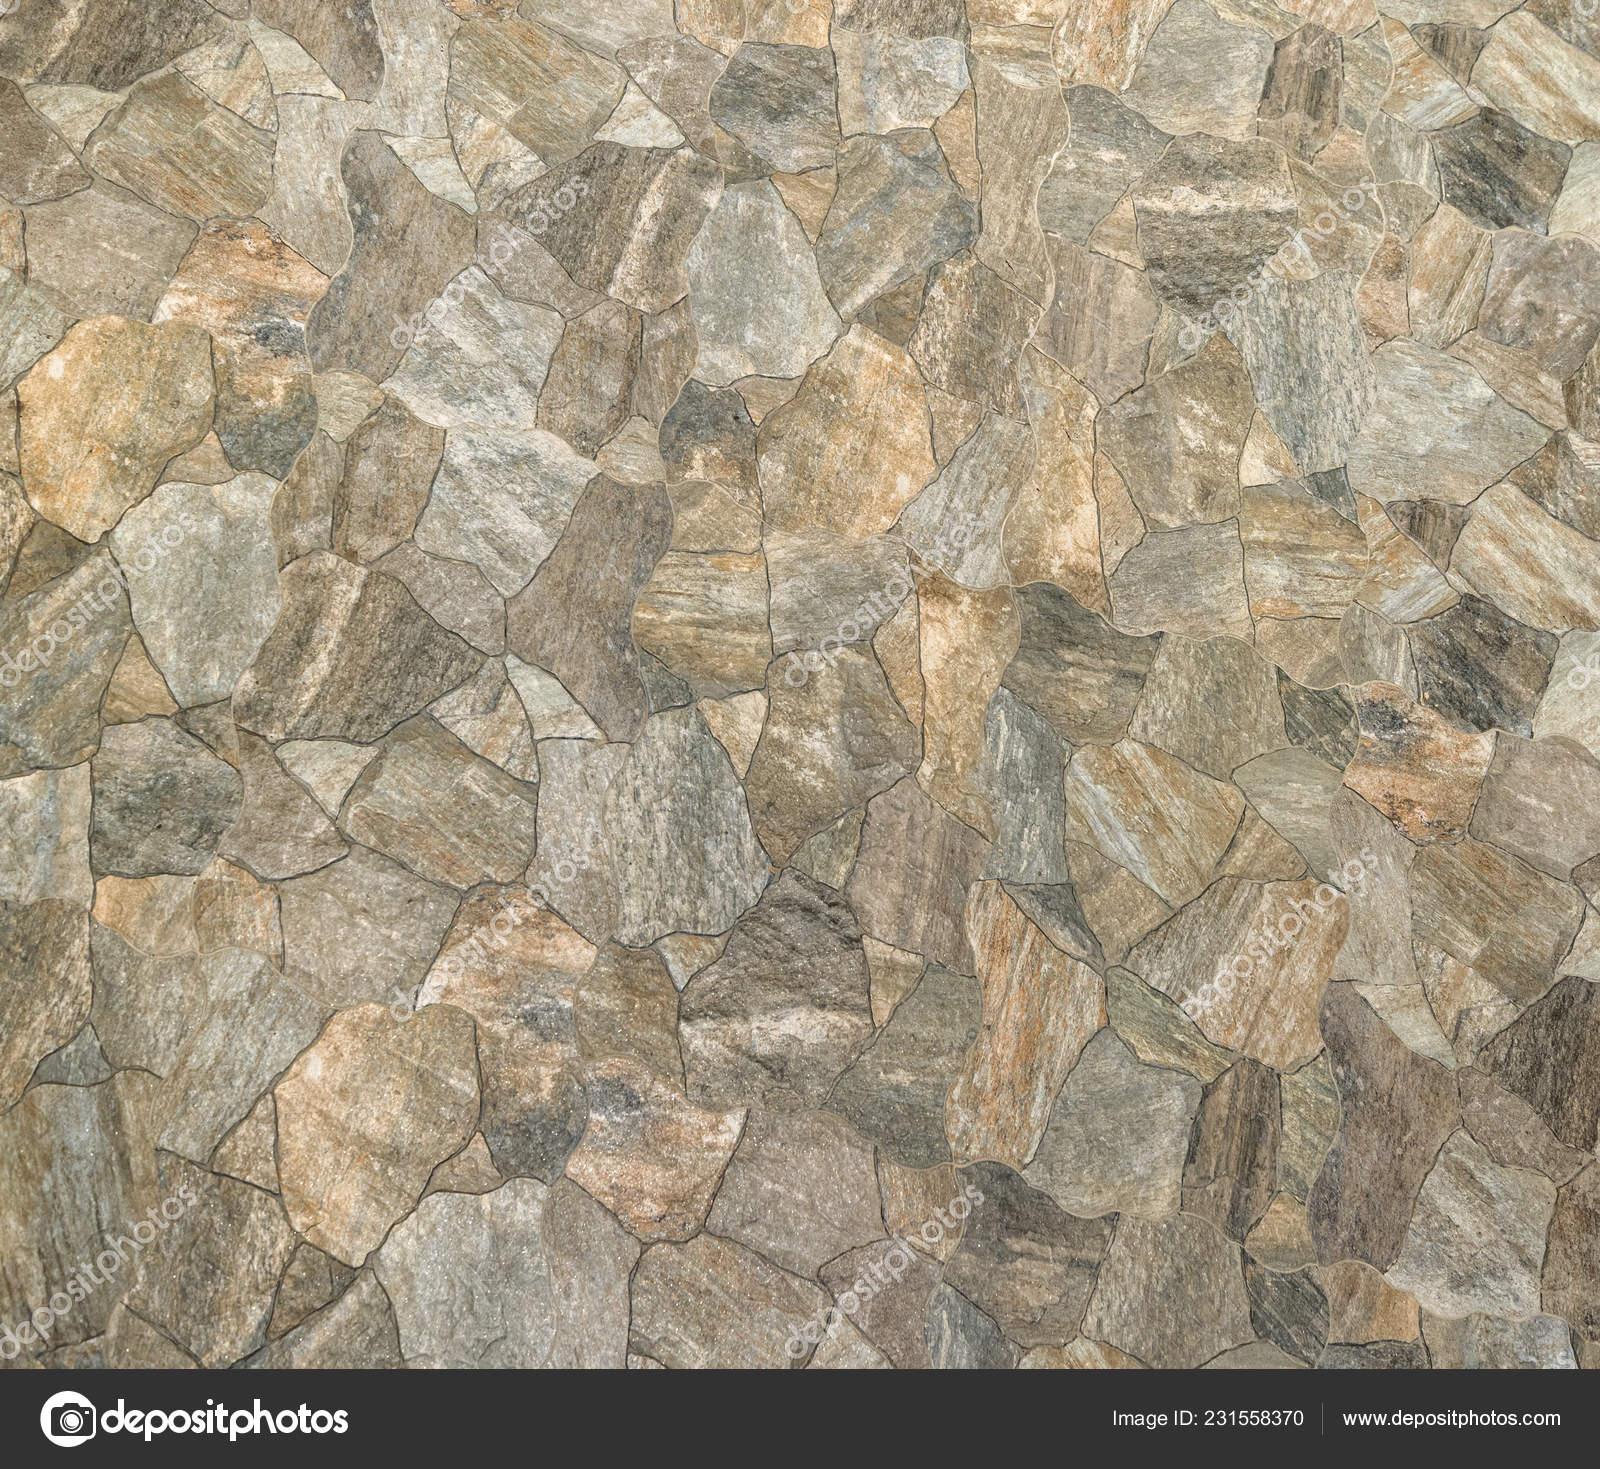 Marble Floor Pattern Design Stone Marble Flooring Pattern Texture Close Interior Material Design Decoration Stock Photo C Tampatra Hotmail Com 231558370